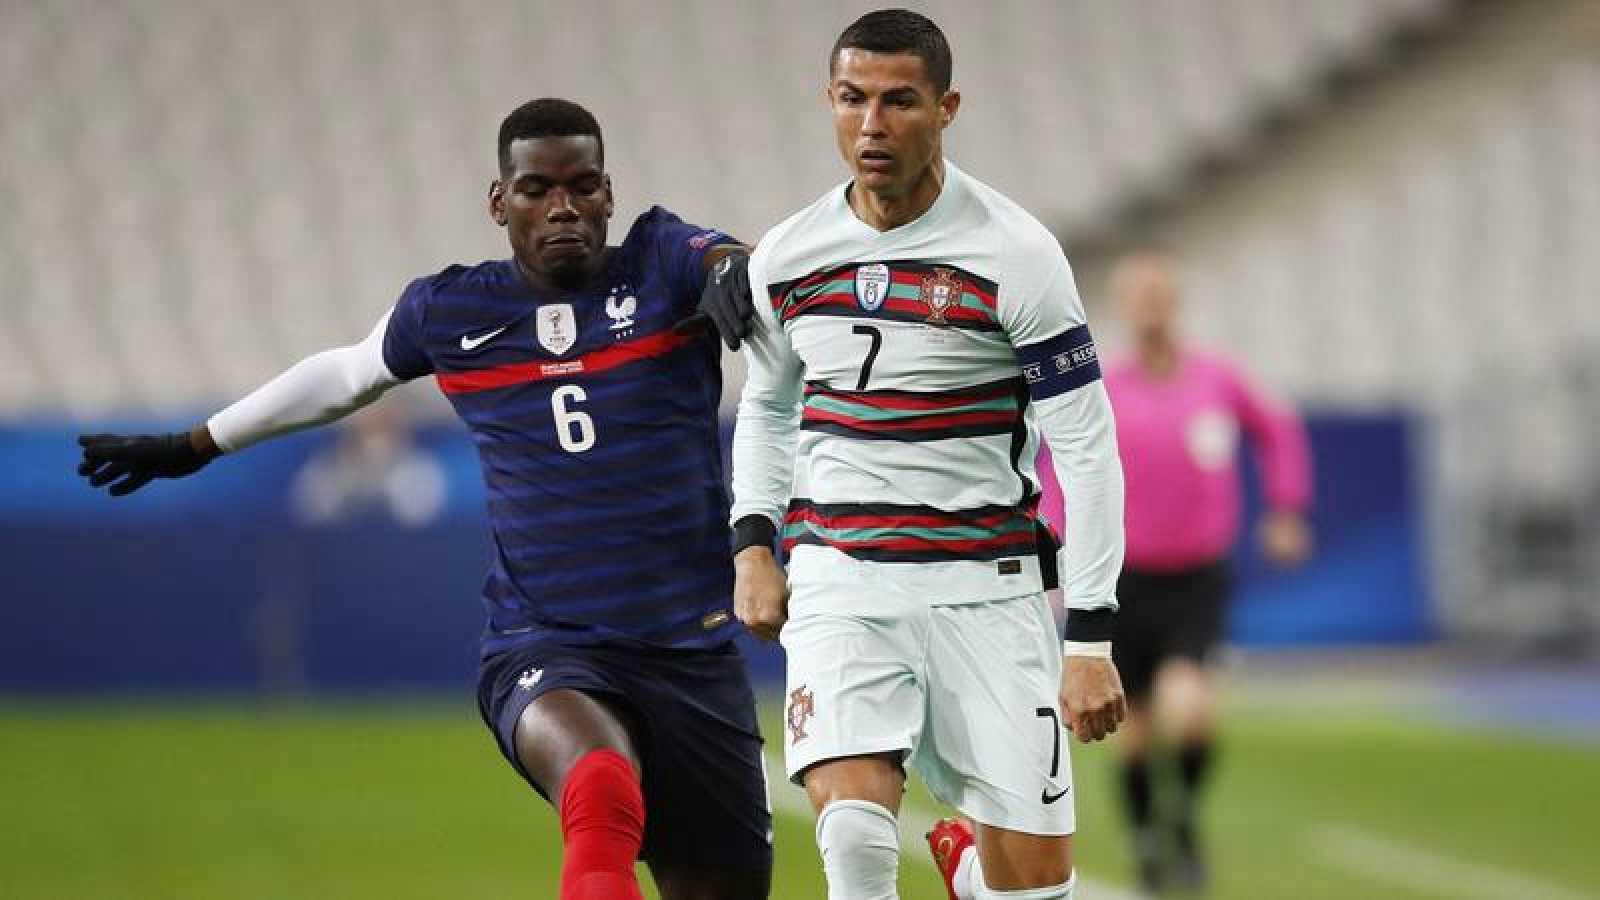 Cristiano Ronaldo, marcado por Pogba en un momento del Francia - Portugal.